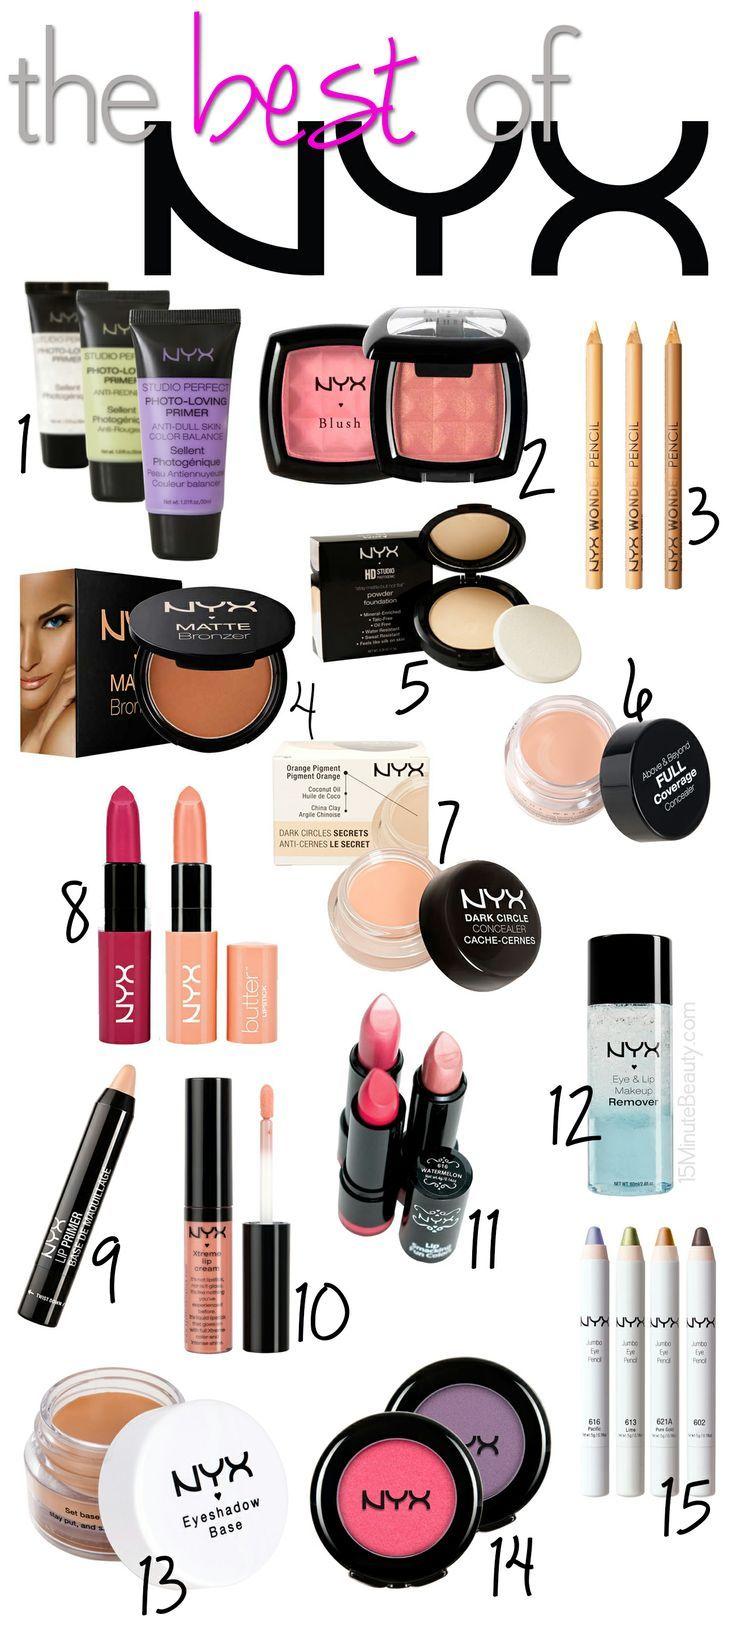 photo regarding Nyx Printable Coupon named Receive Attractiveness Upon Printable Coupon codes Make-up Attractiveness make-up